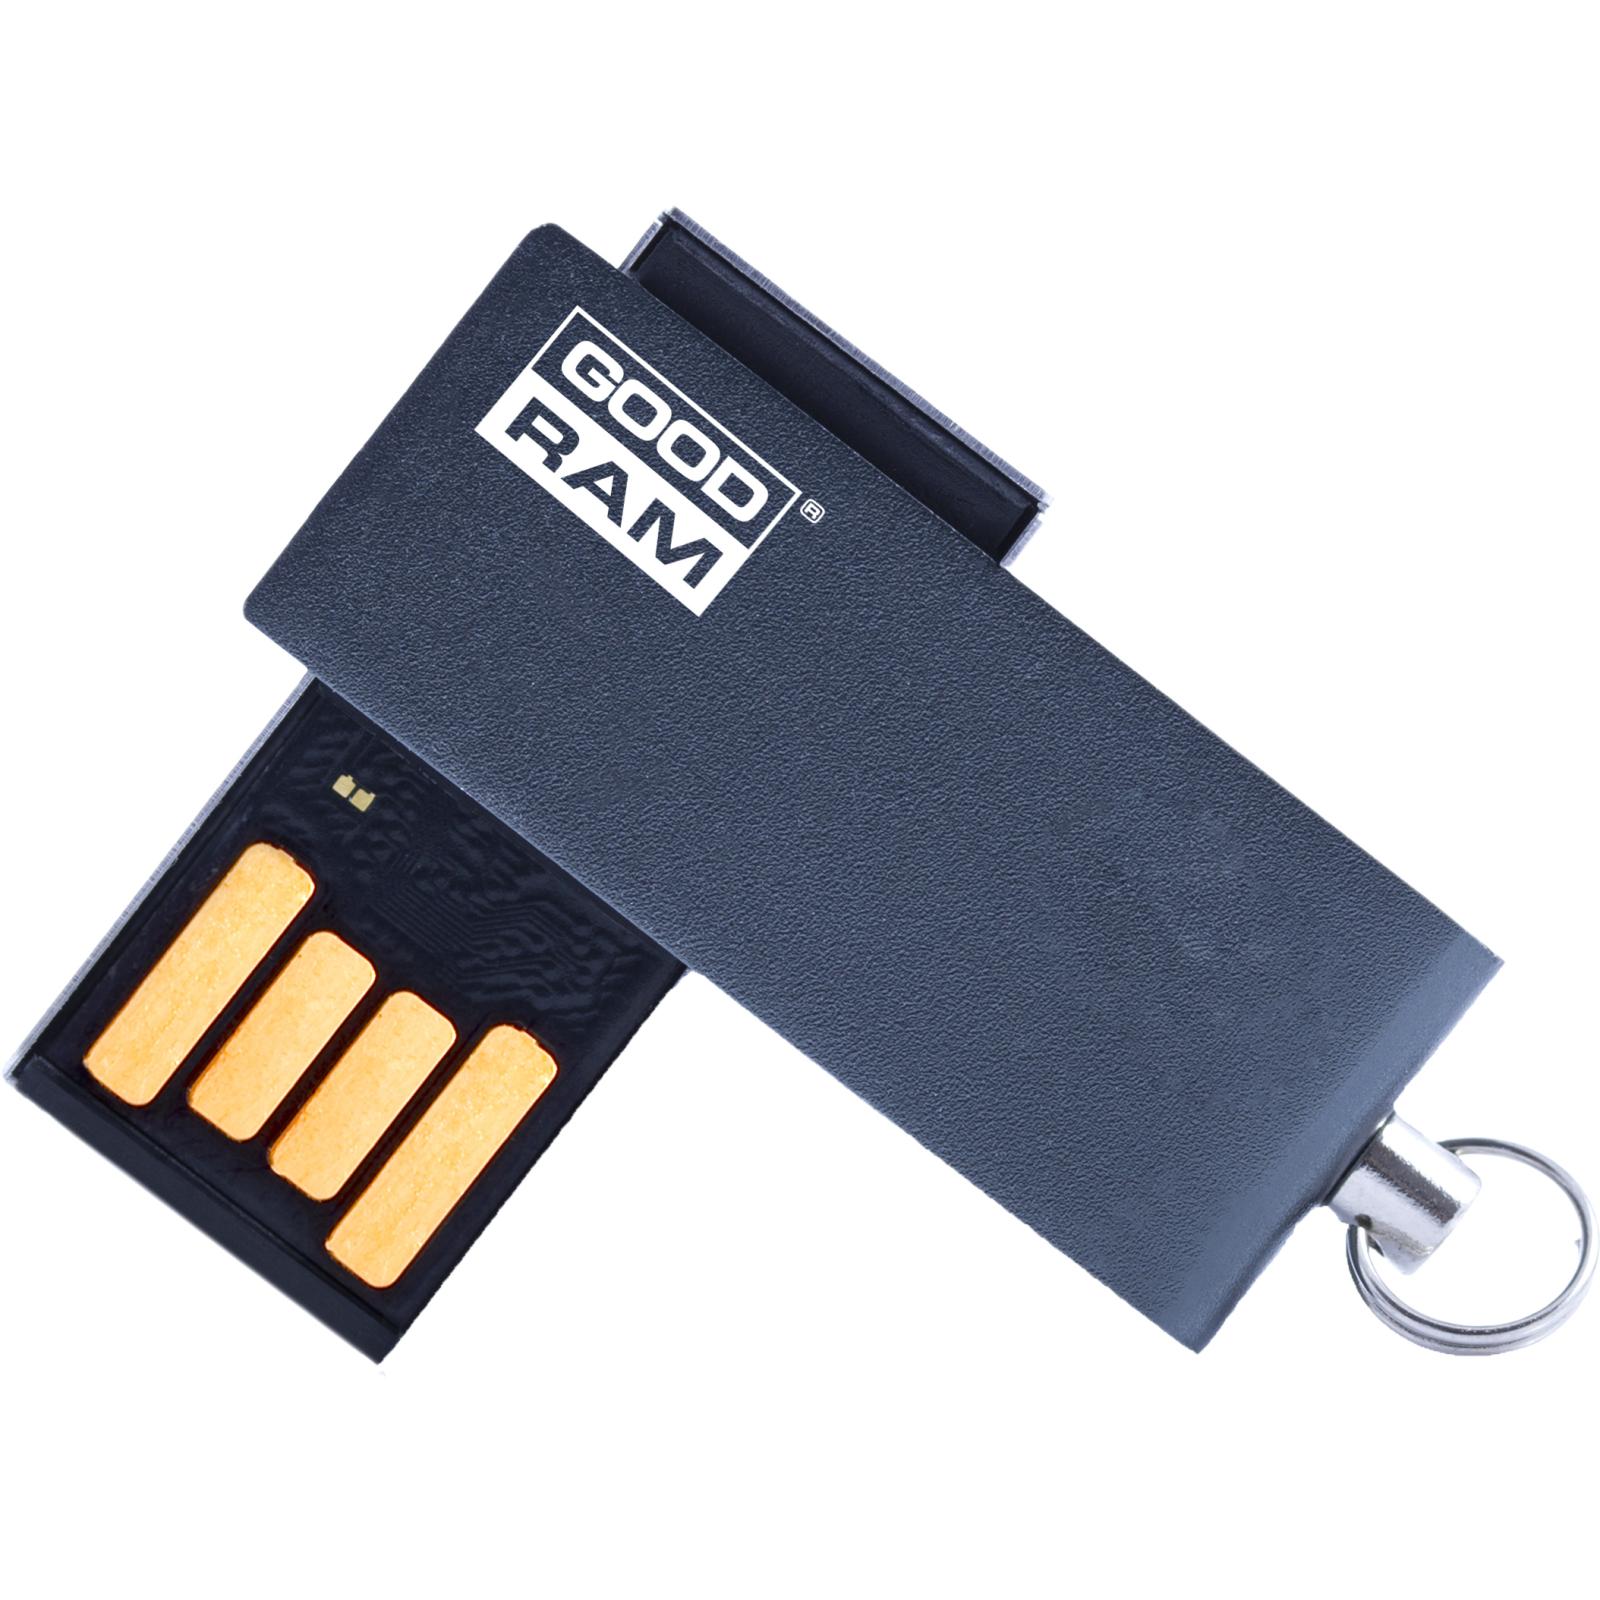 USB флеш накопитель Goodram 32GB UCU2 Cube Graphite USB 2.0 (UCU2-0320E0R11)